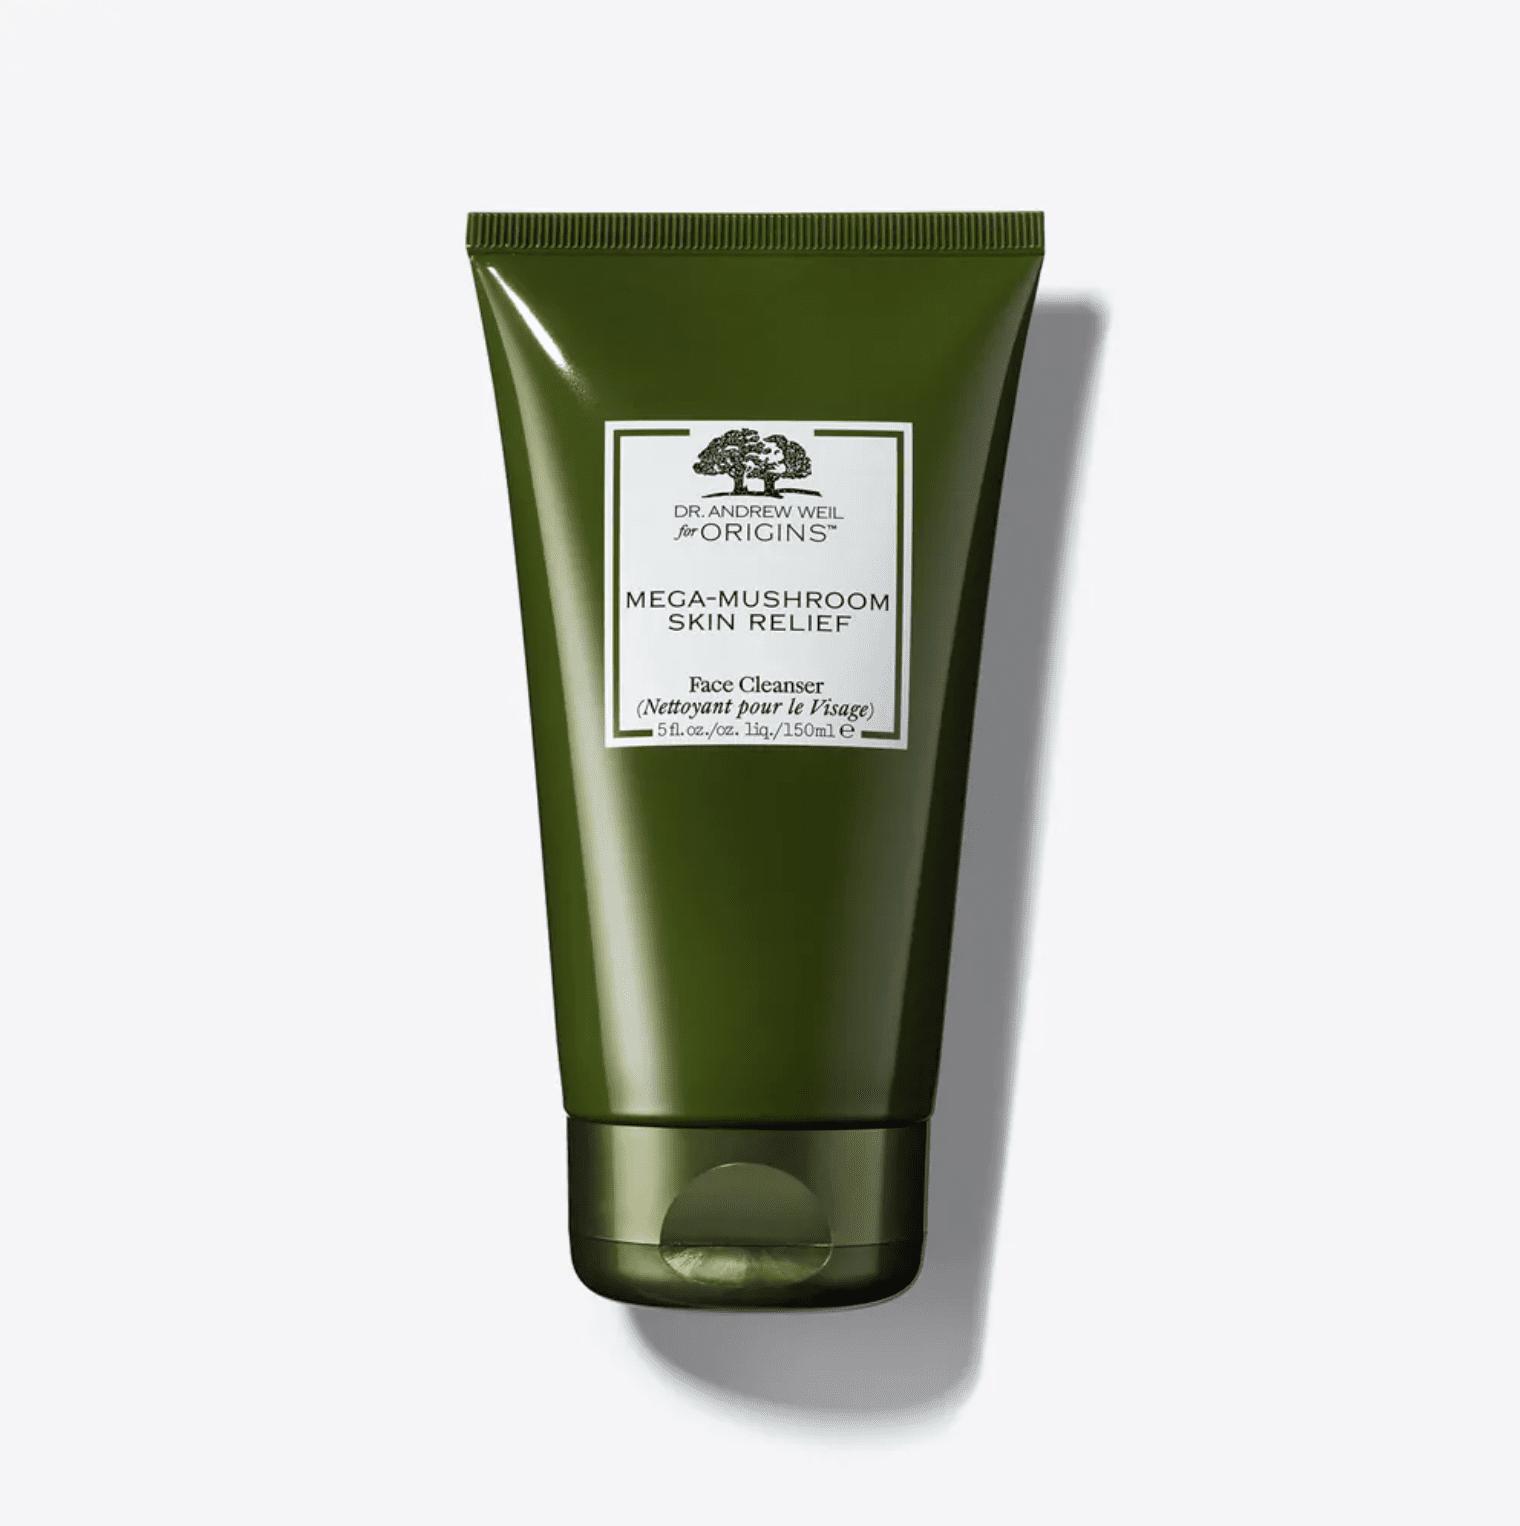 Mega-Mushroom Skin Relief Face Cleanser